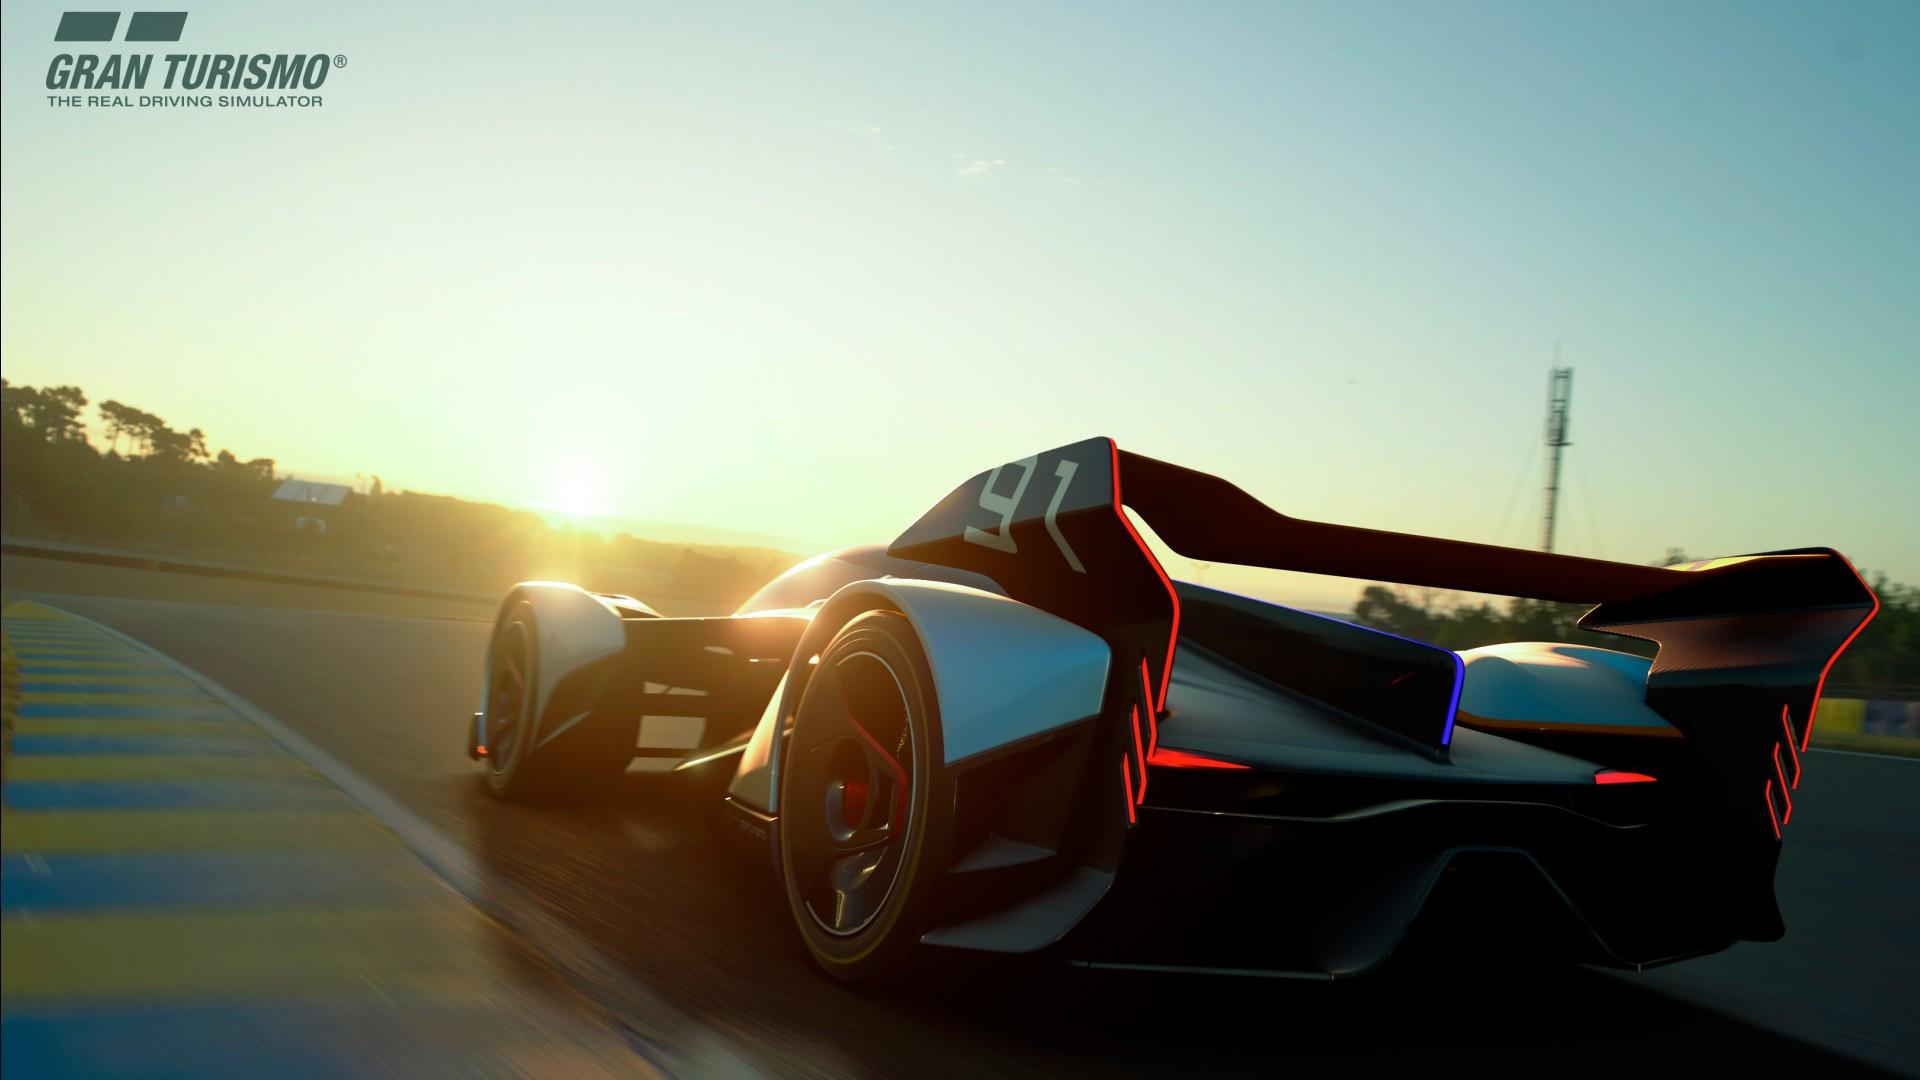 High Performance Car Pc Desktop Wallpaper Mclaren Ultimate Vision Gt Ps4 Gran Turismo Sport